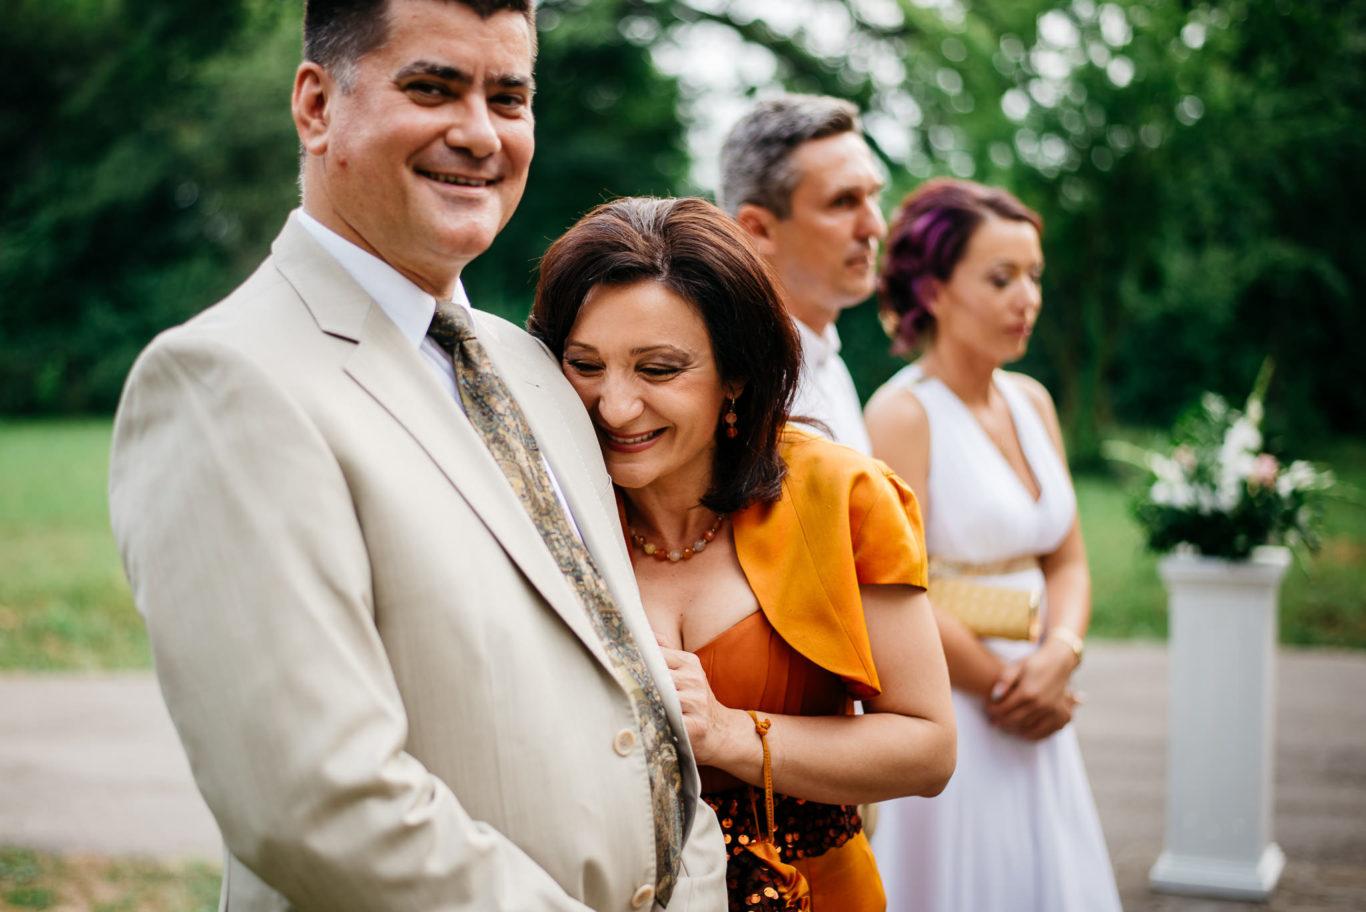 0345-Fotografie-nunta-Stirbey-Laura-Rares-fotograf-Ciprian-Dumitrescu-DSC_6863